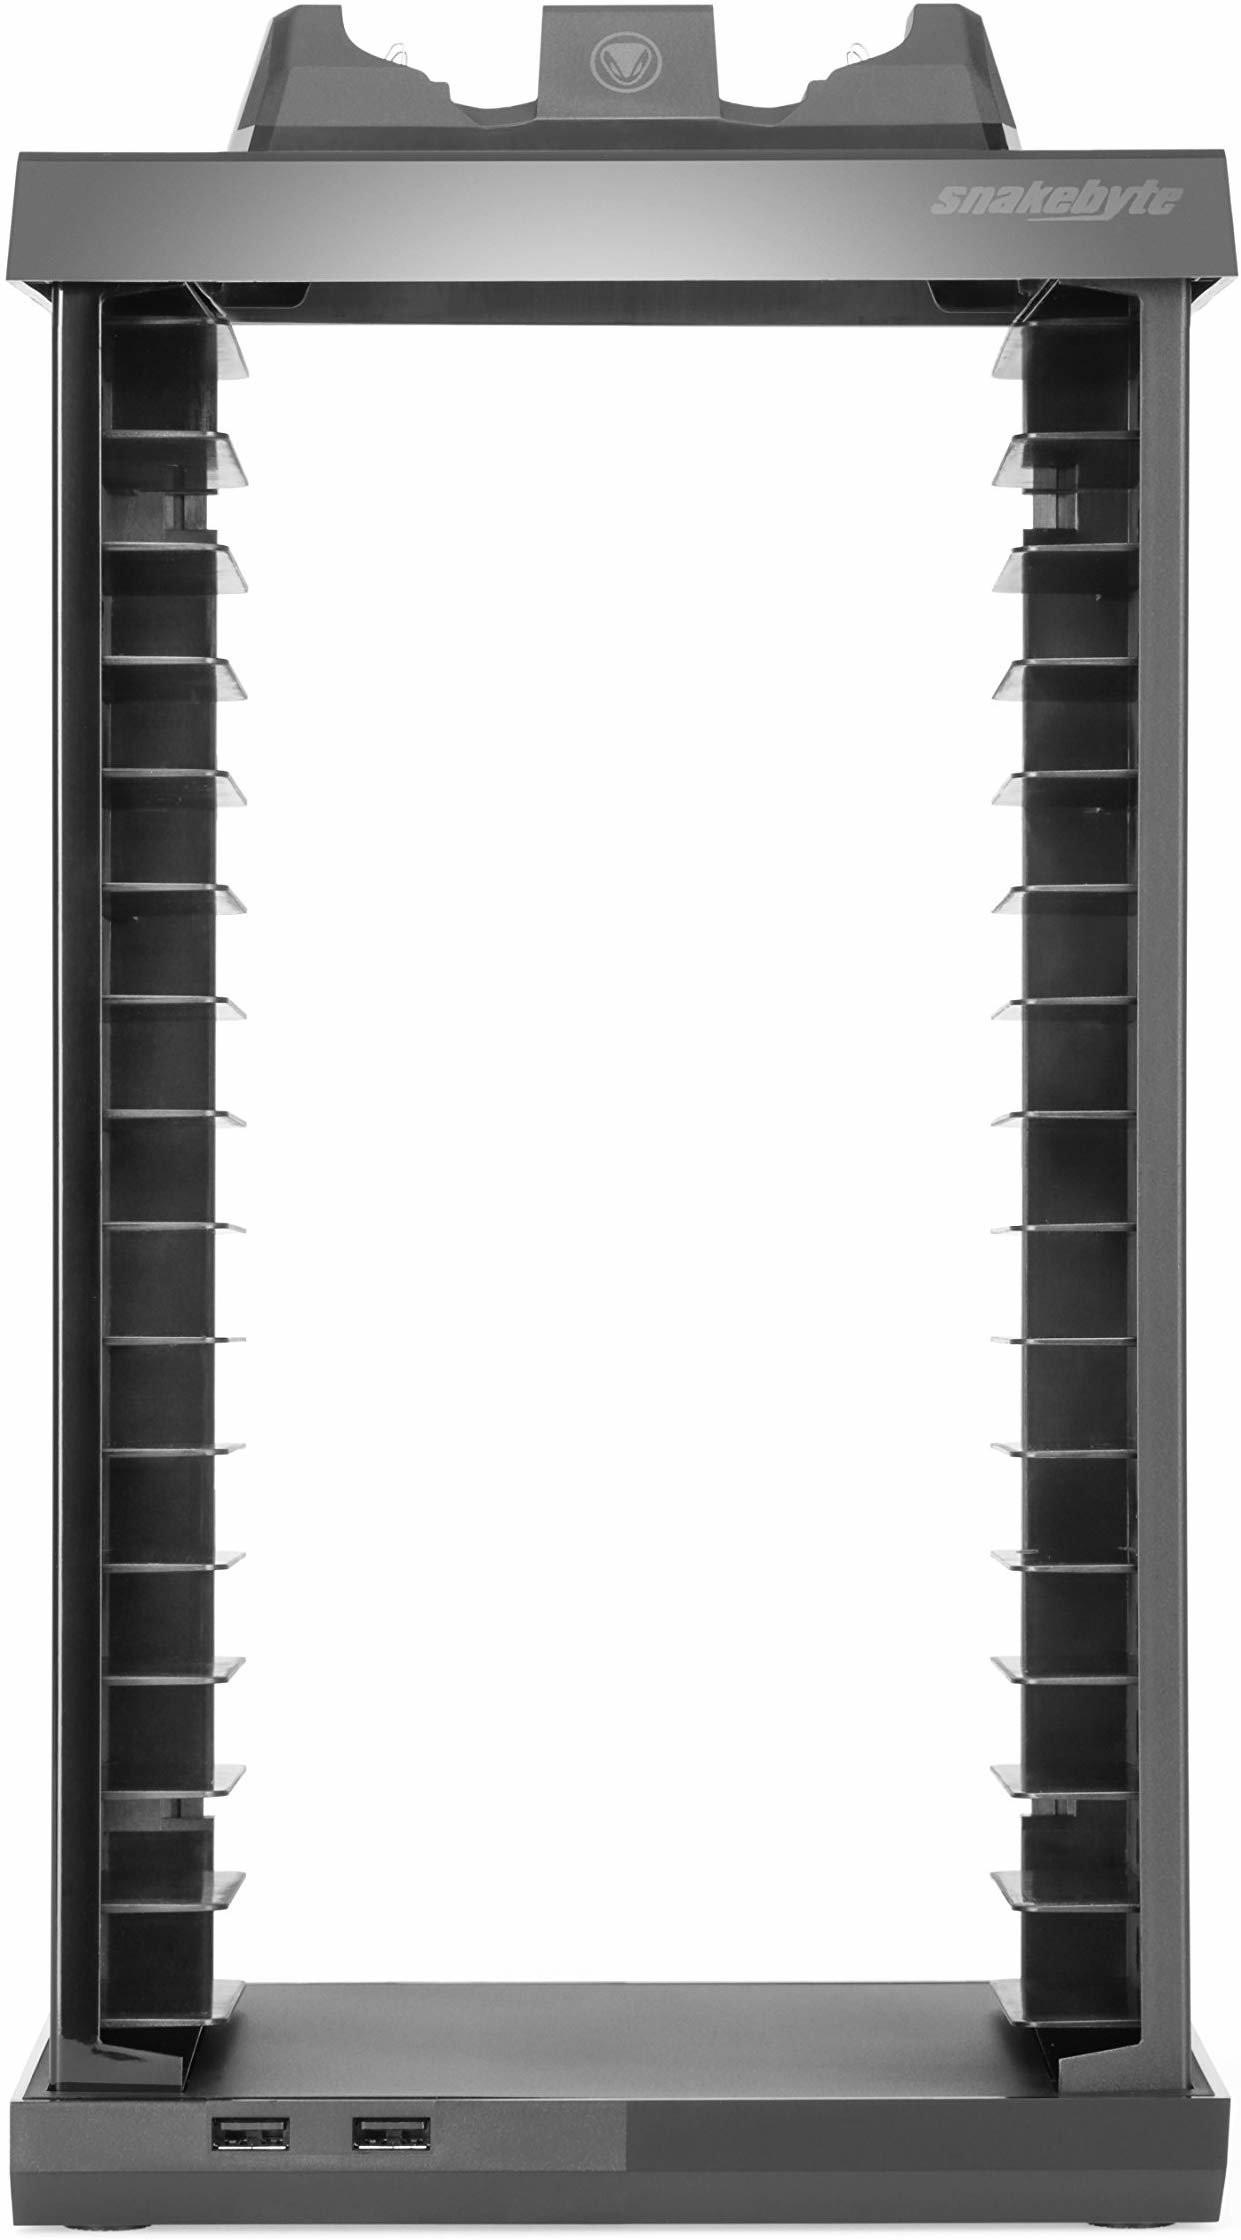 SNAKEBYTE Stacja ładująca SNAKEBYTE The Charge Tower Pro do Xbox One